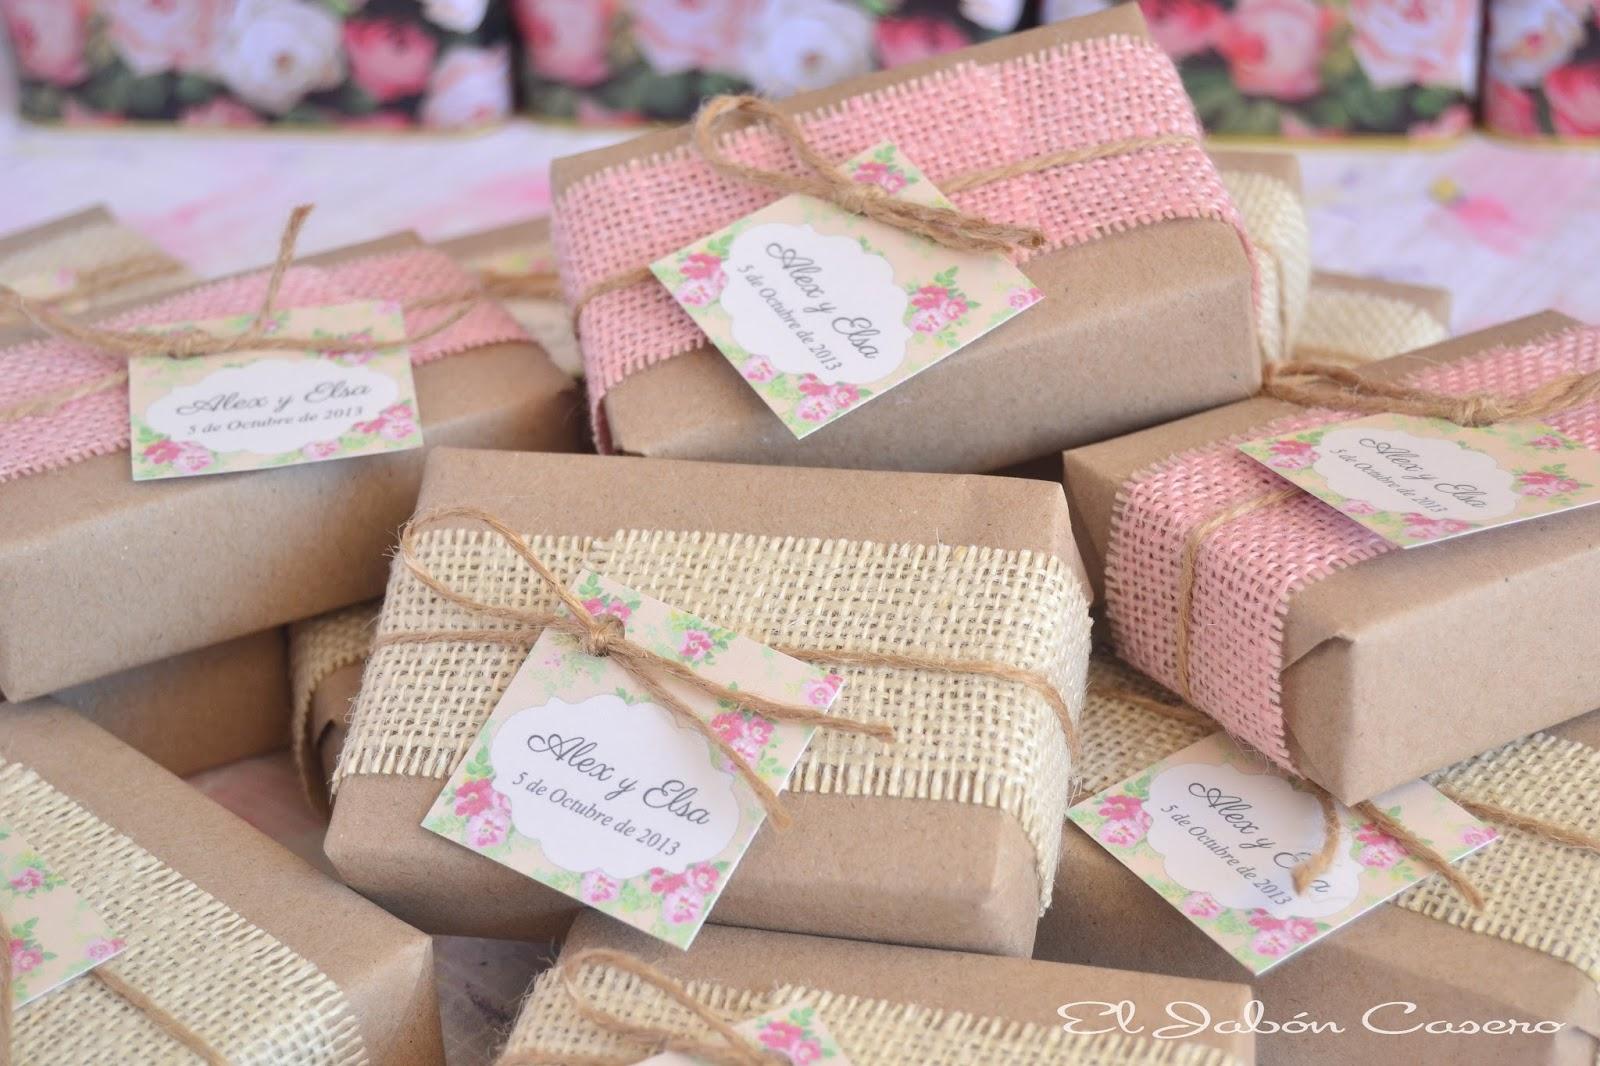 Detalles de boda ecologica jabones